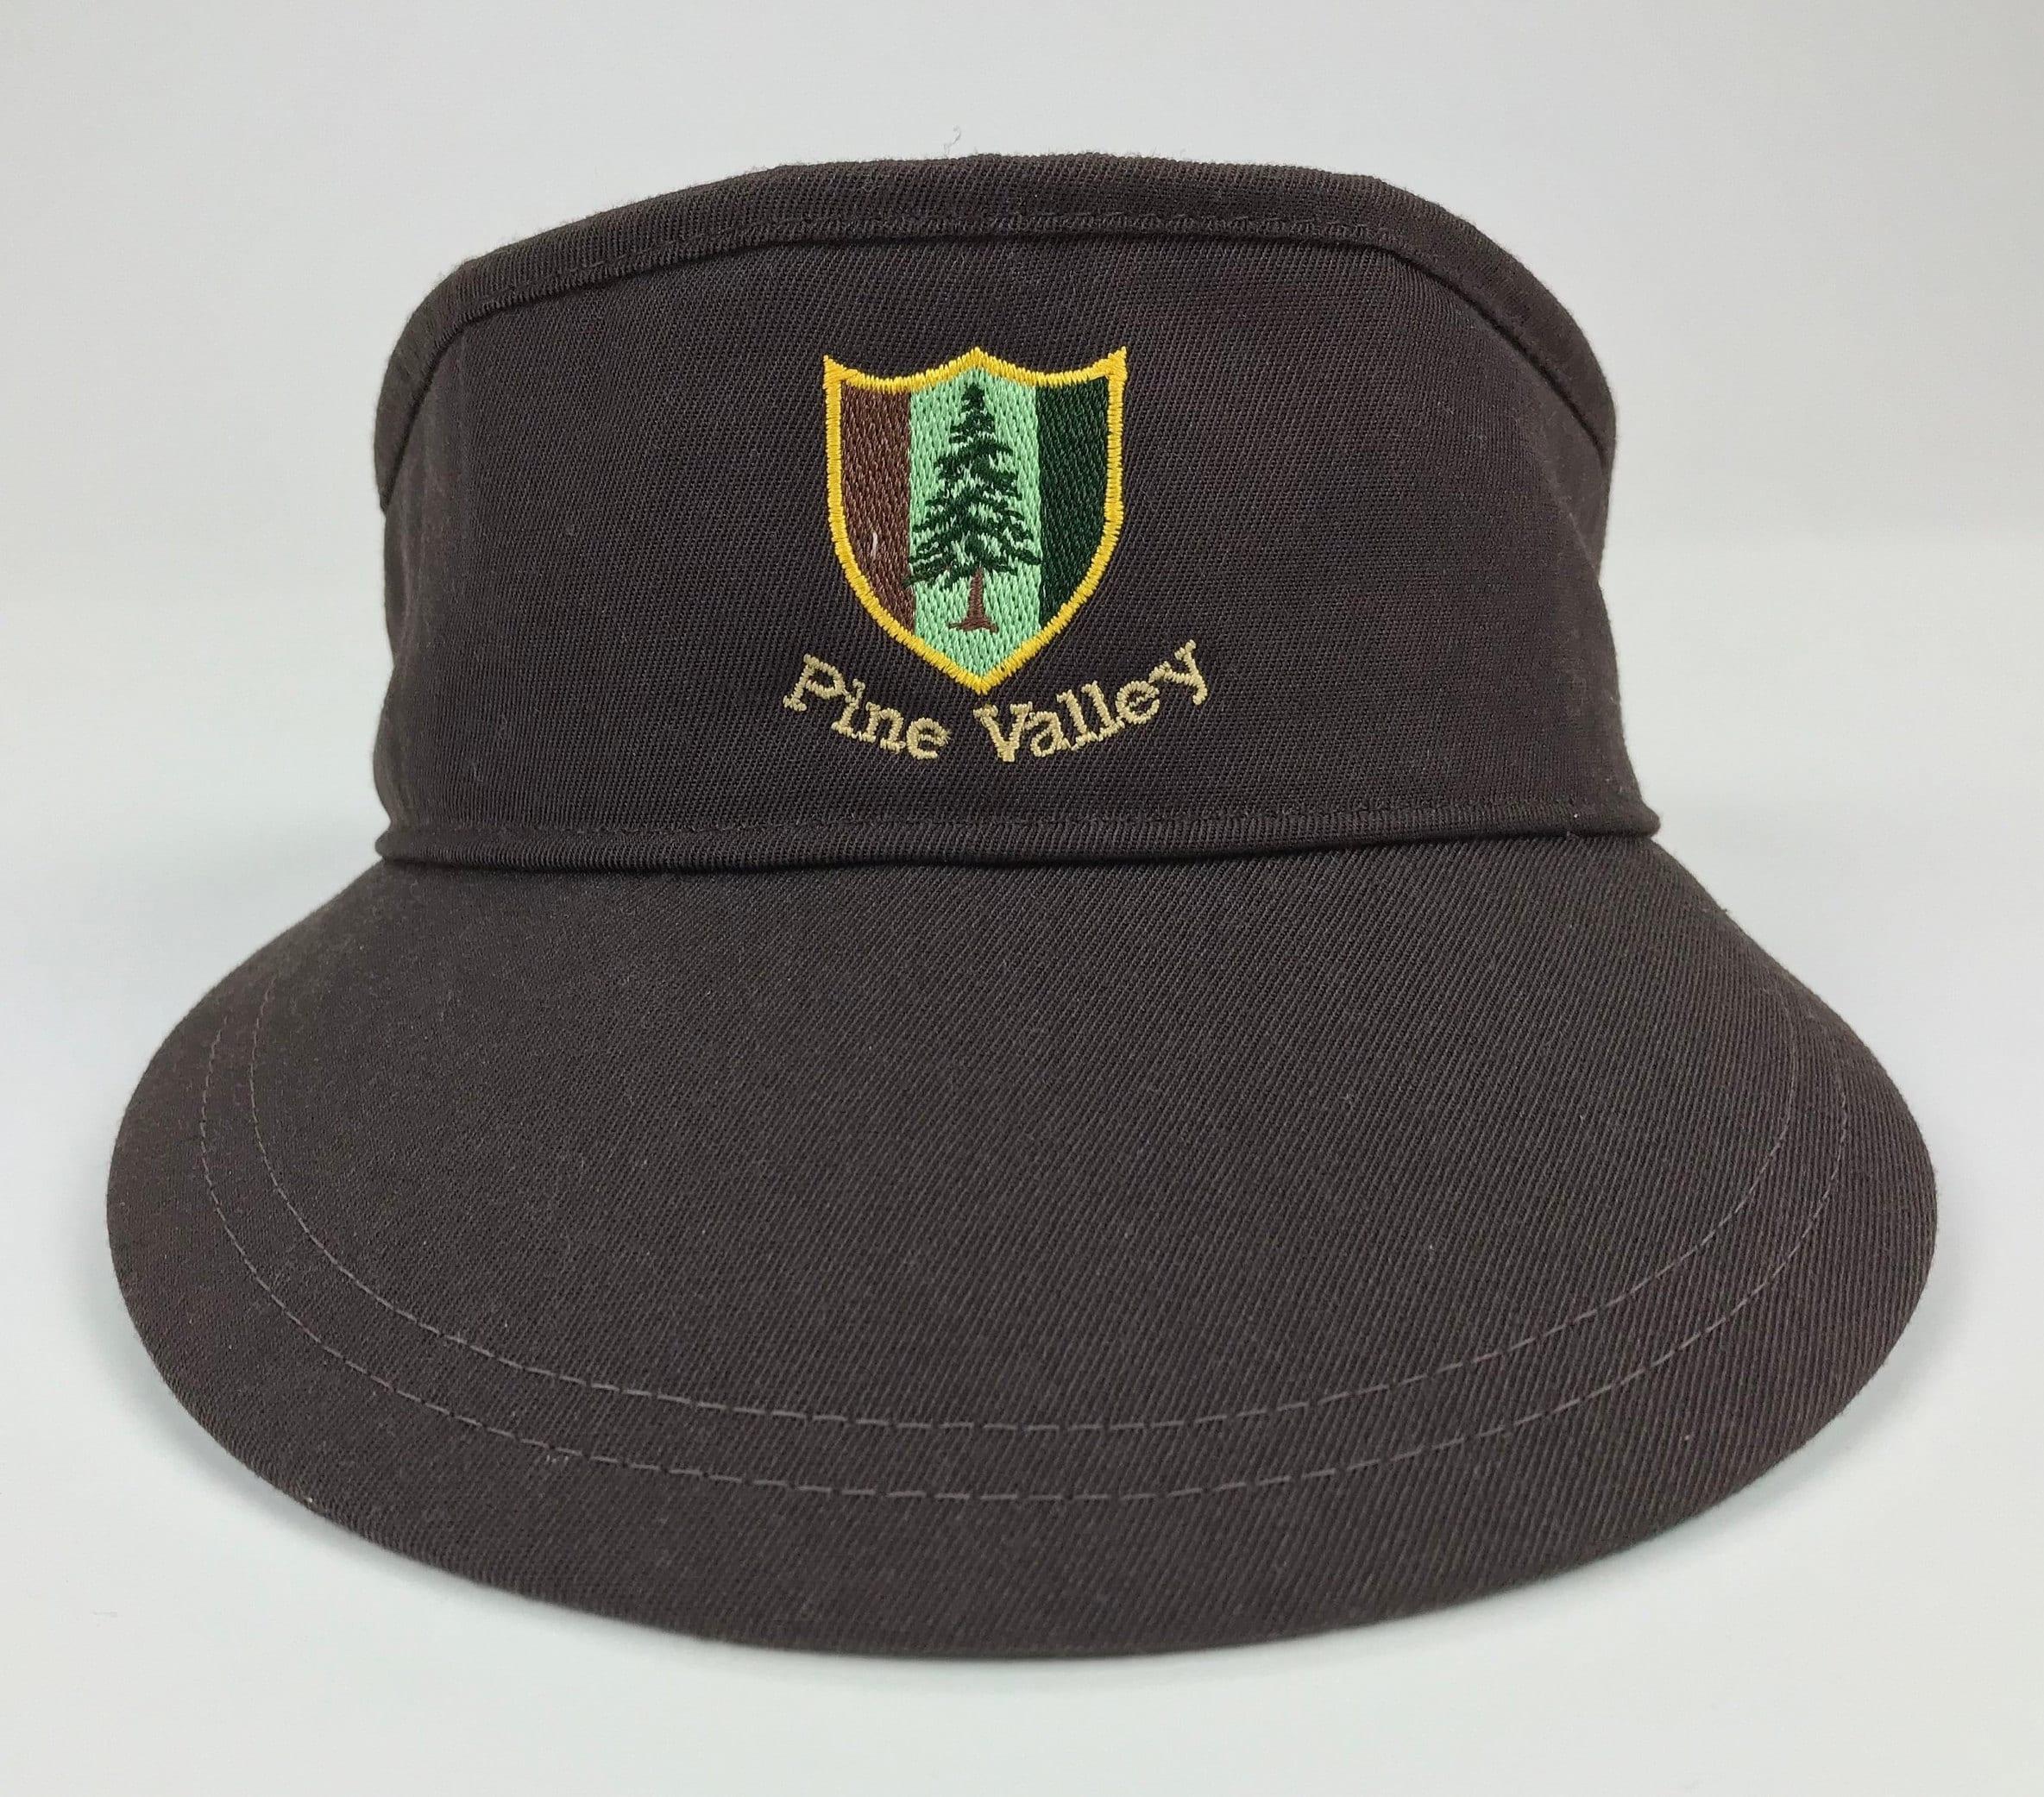 Vintage New Era Pine Valley Golf Course Pro Design Dupont ...